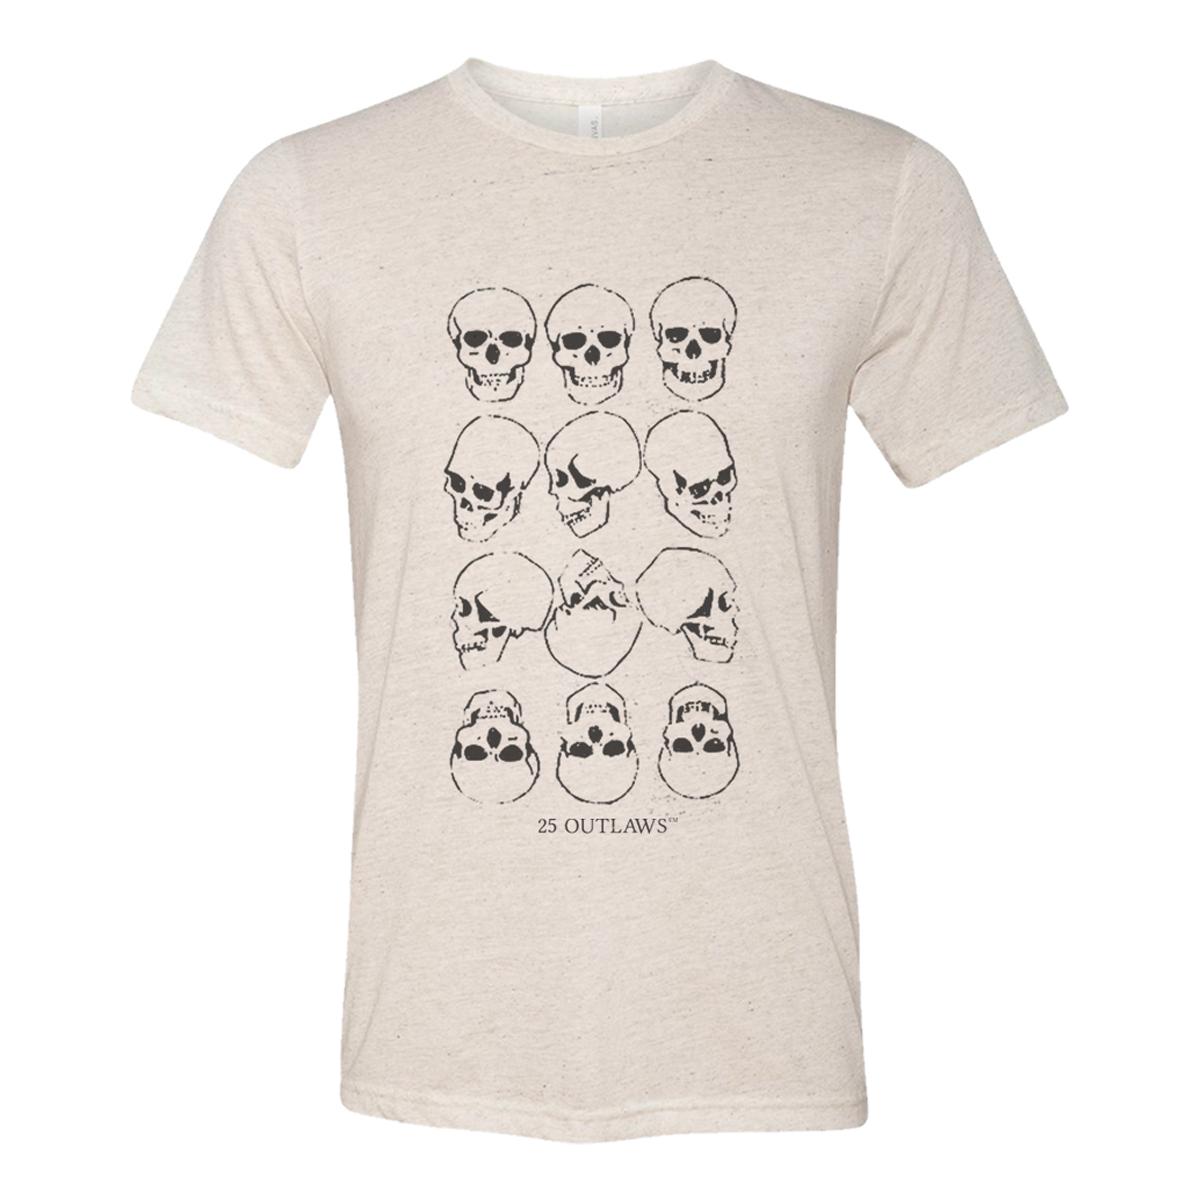 25 Outlaws Skulls T-Shirt